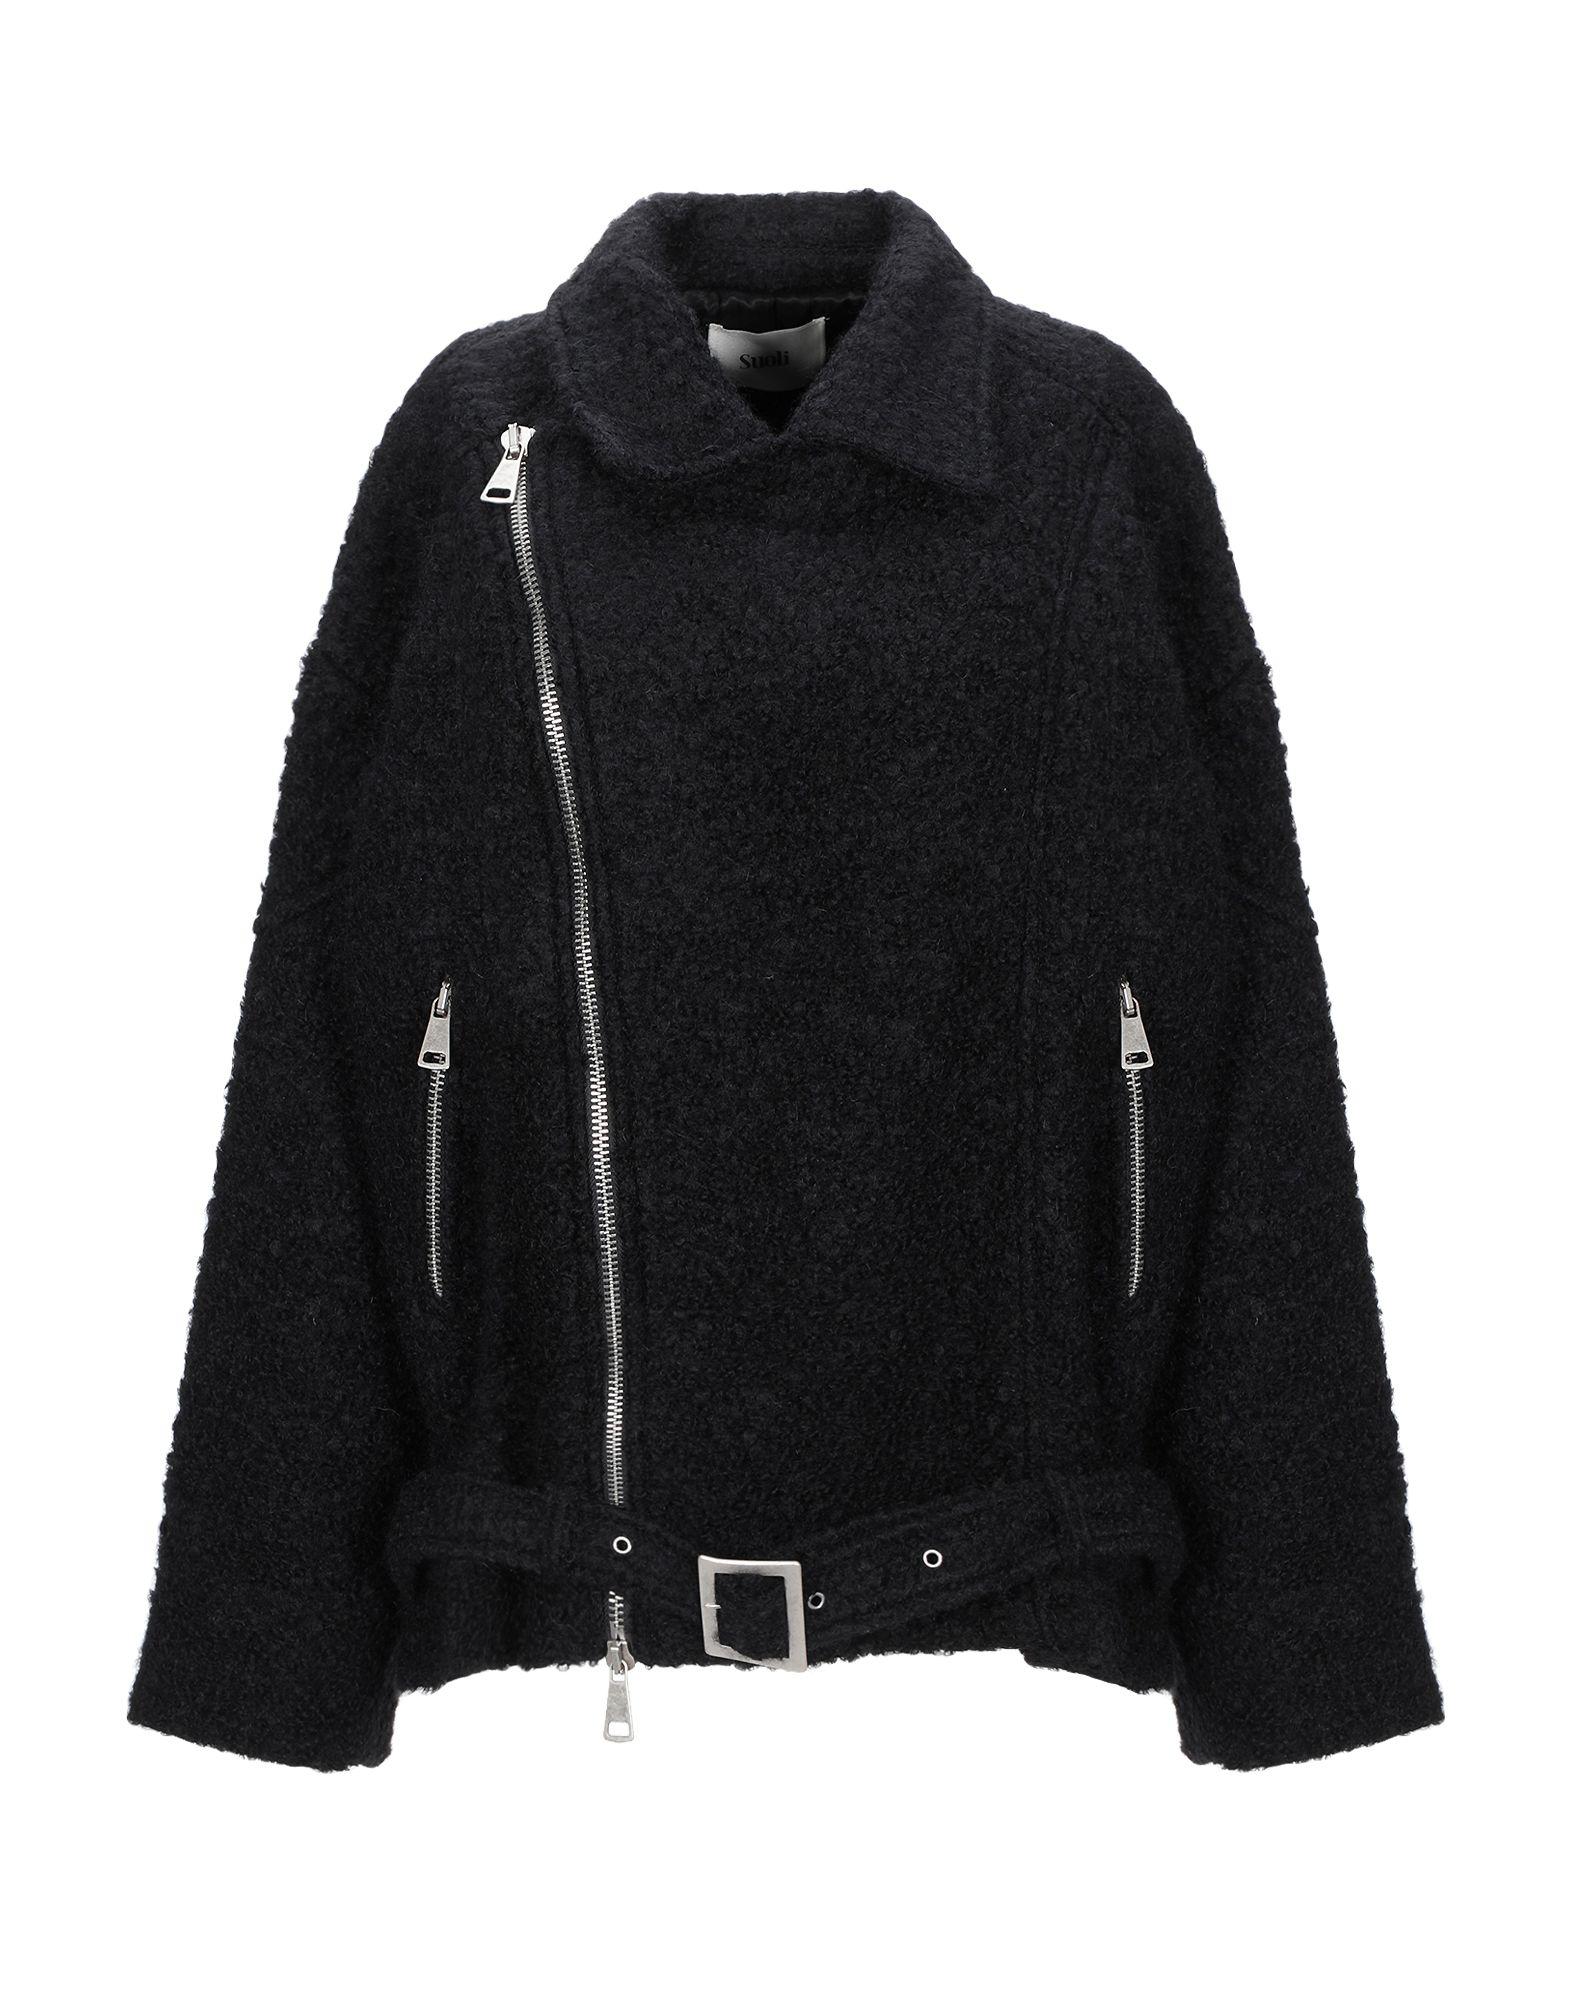 YUNY Women Notch Collar Outwear Short Woolen Trim-Fit 2 Button Peacoat Camel XS